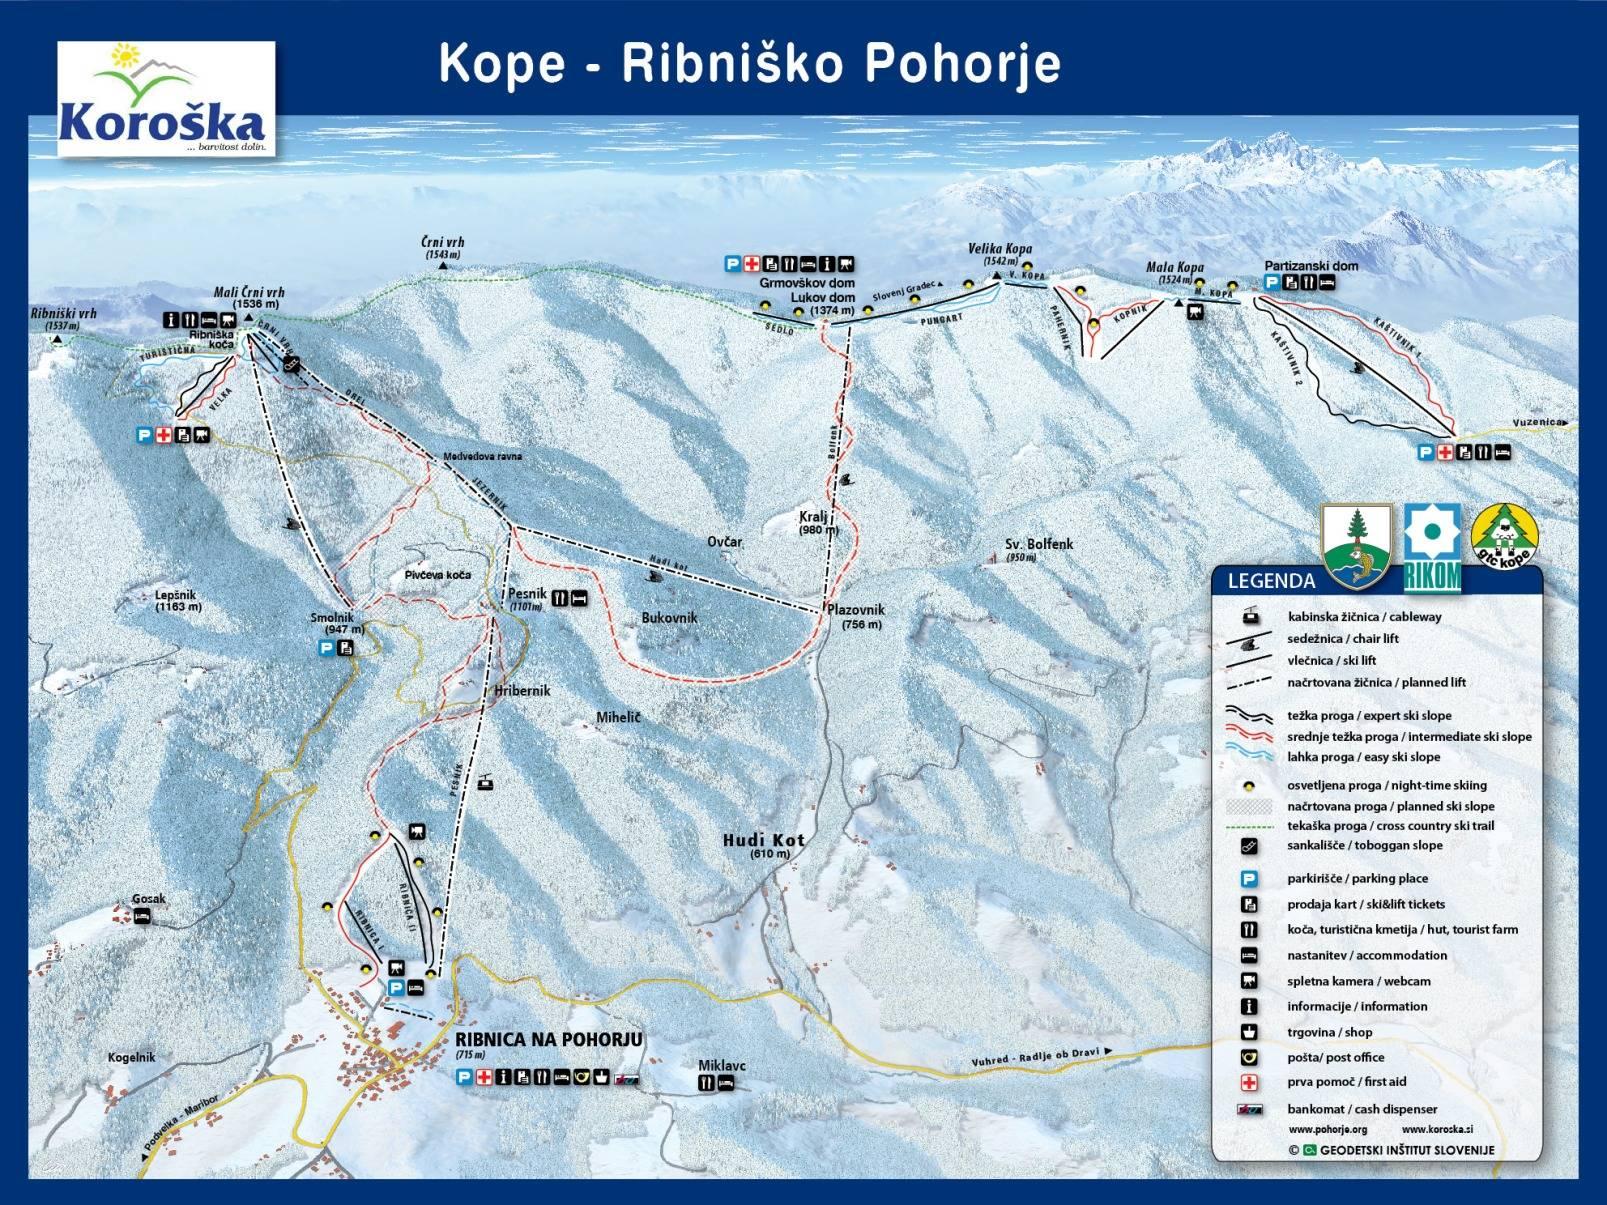 http://sielok.hu/images/siterkepek/kope.jpg